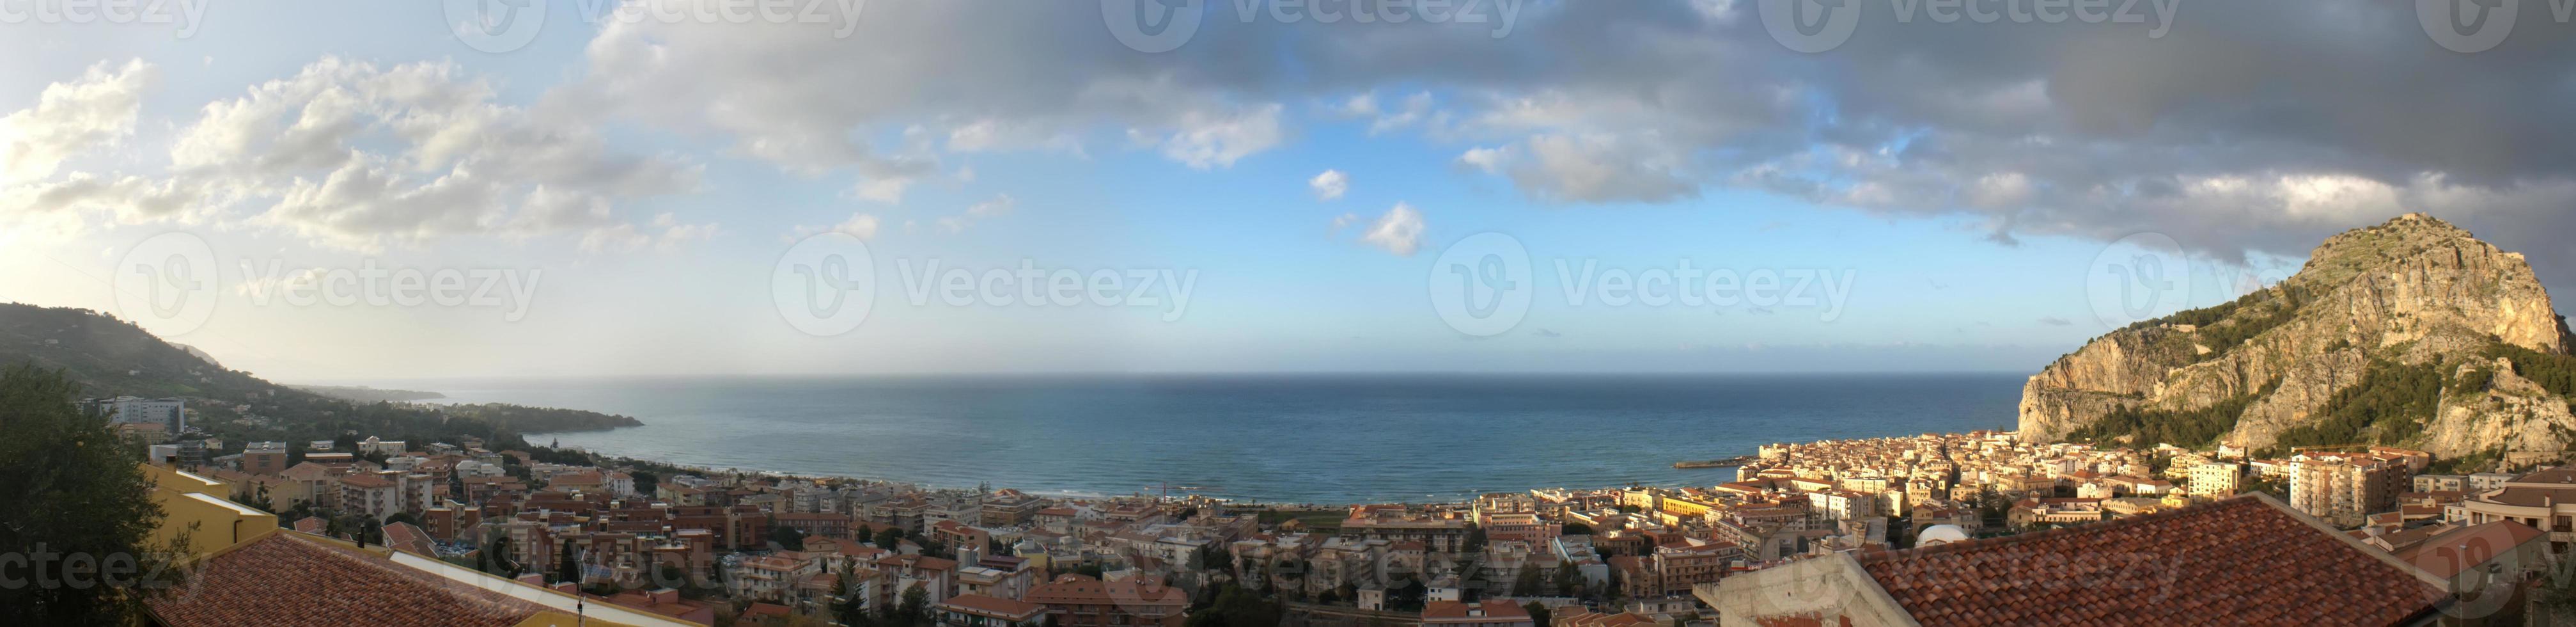 Panoramic view of the Cefalu photo